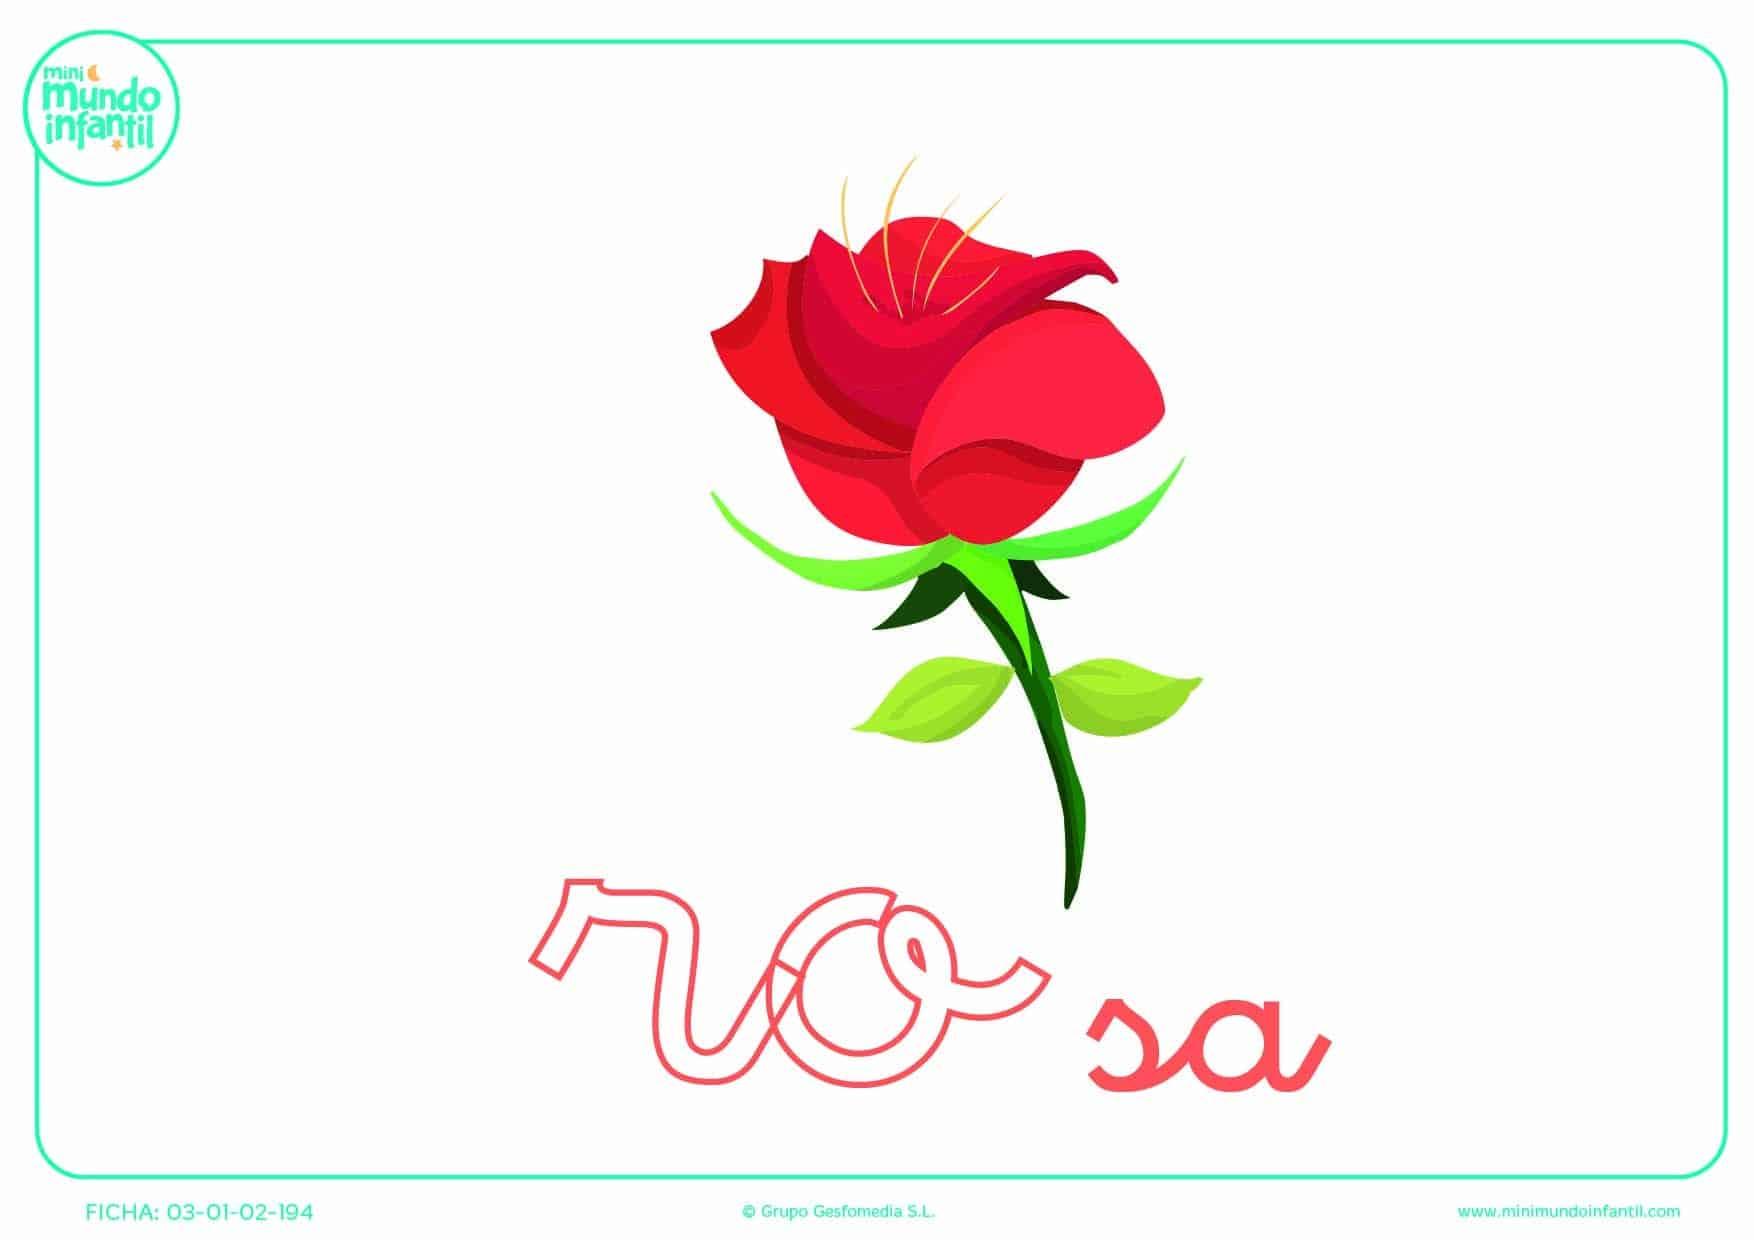 Sílaba RO minúscula de rosa para poner color